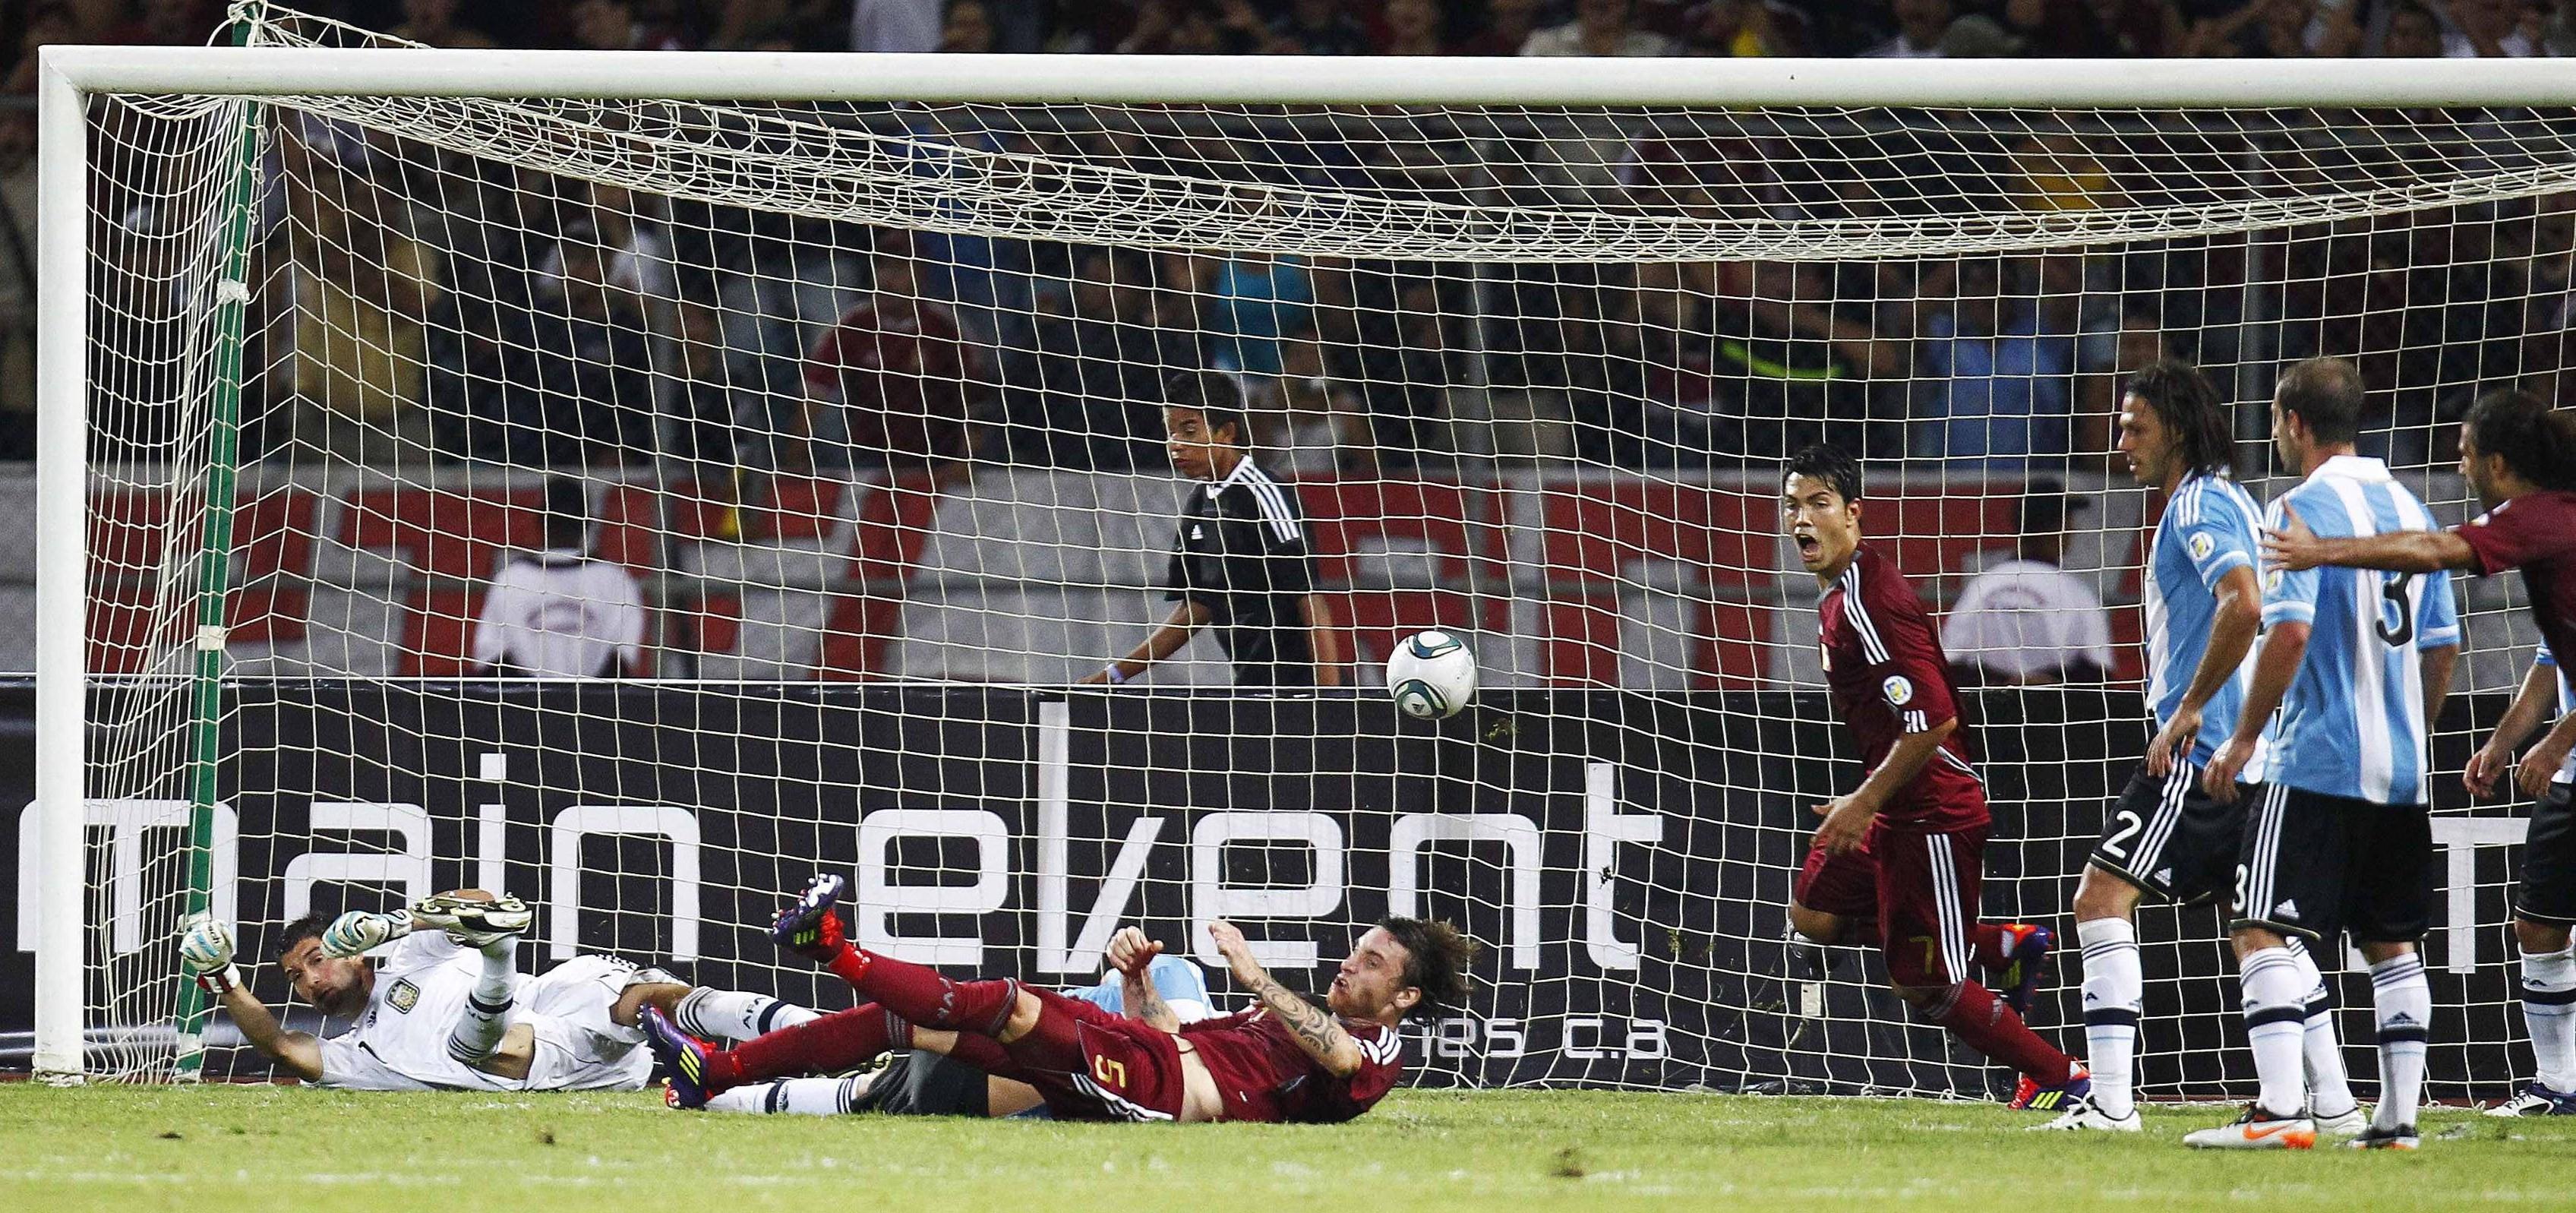 El triunfo Vinotinto sobre Argentina por la eliminatoria de Brasil 2014 (Video)